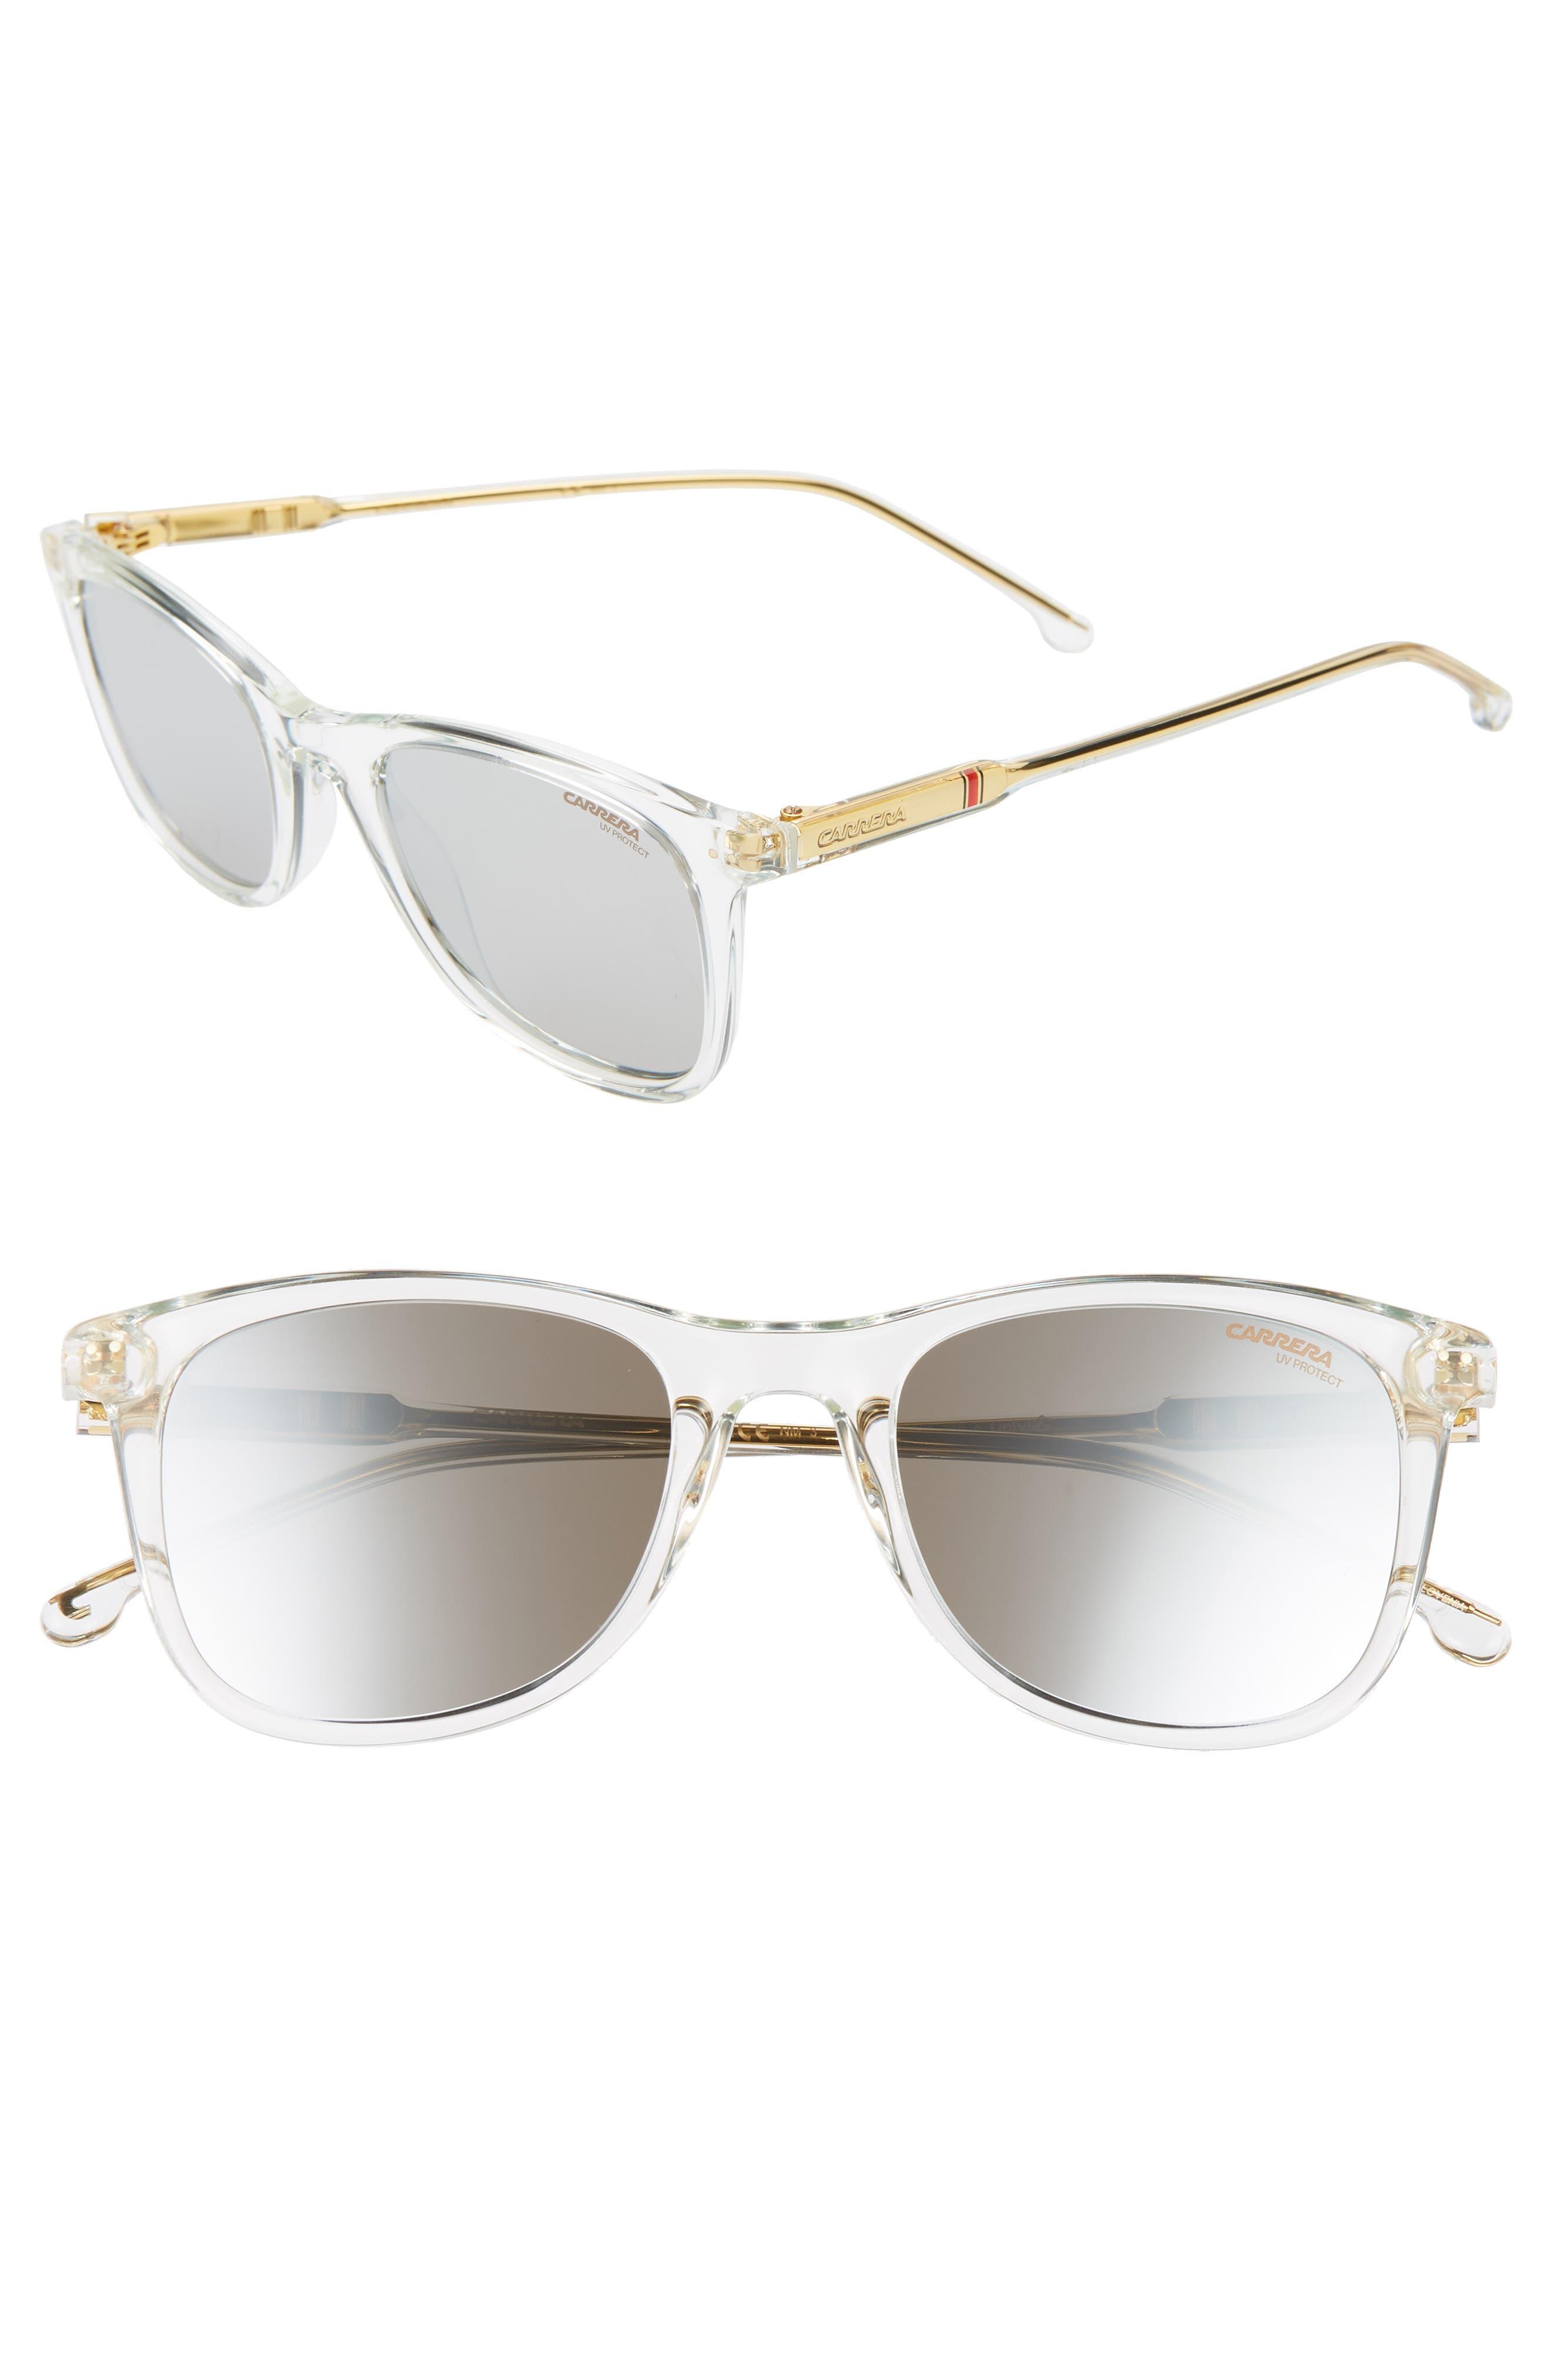 Carrera Eyewear 51Mm Sunglasses - Crystal